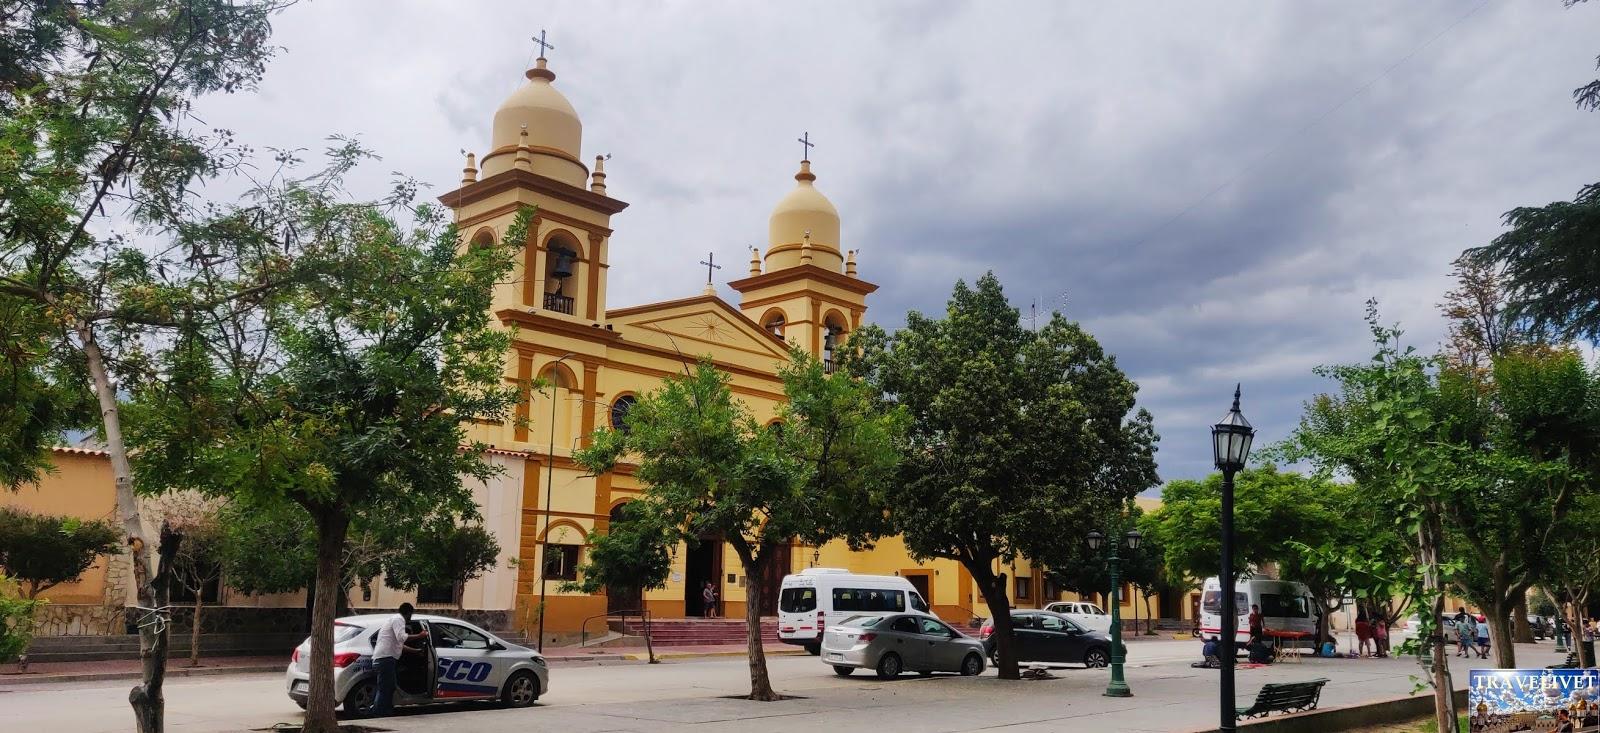 Argentine Salta Cafayate boucle nord et sud